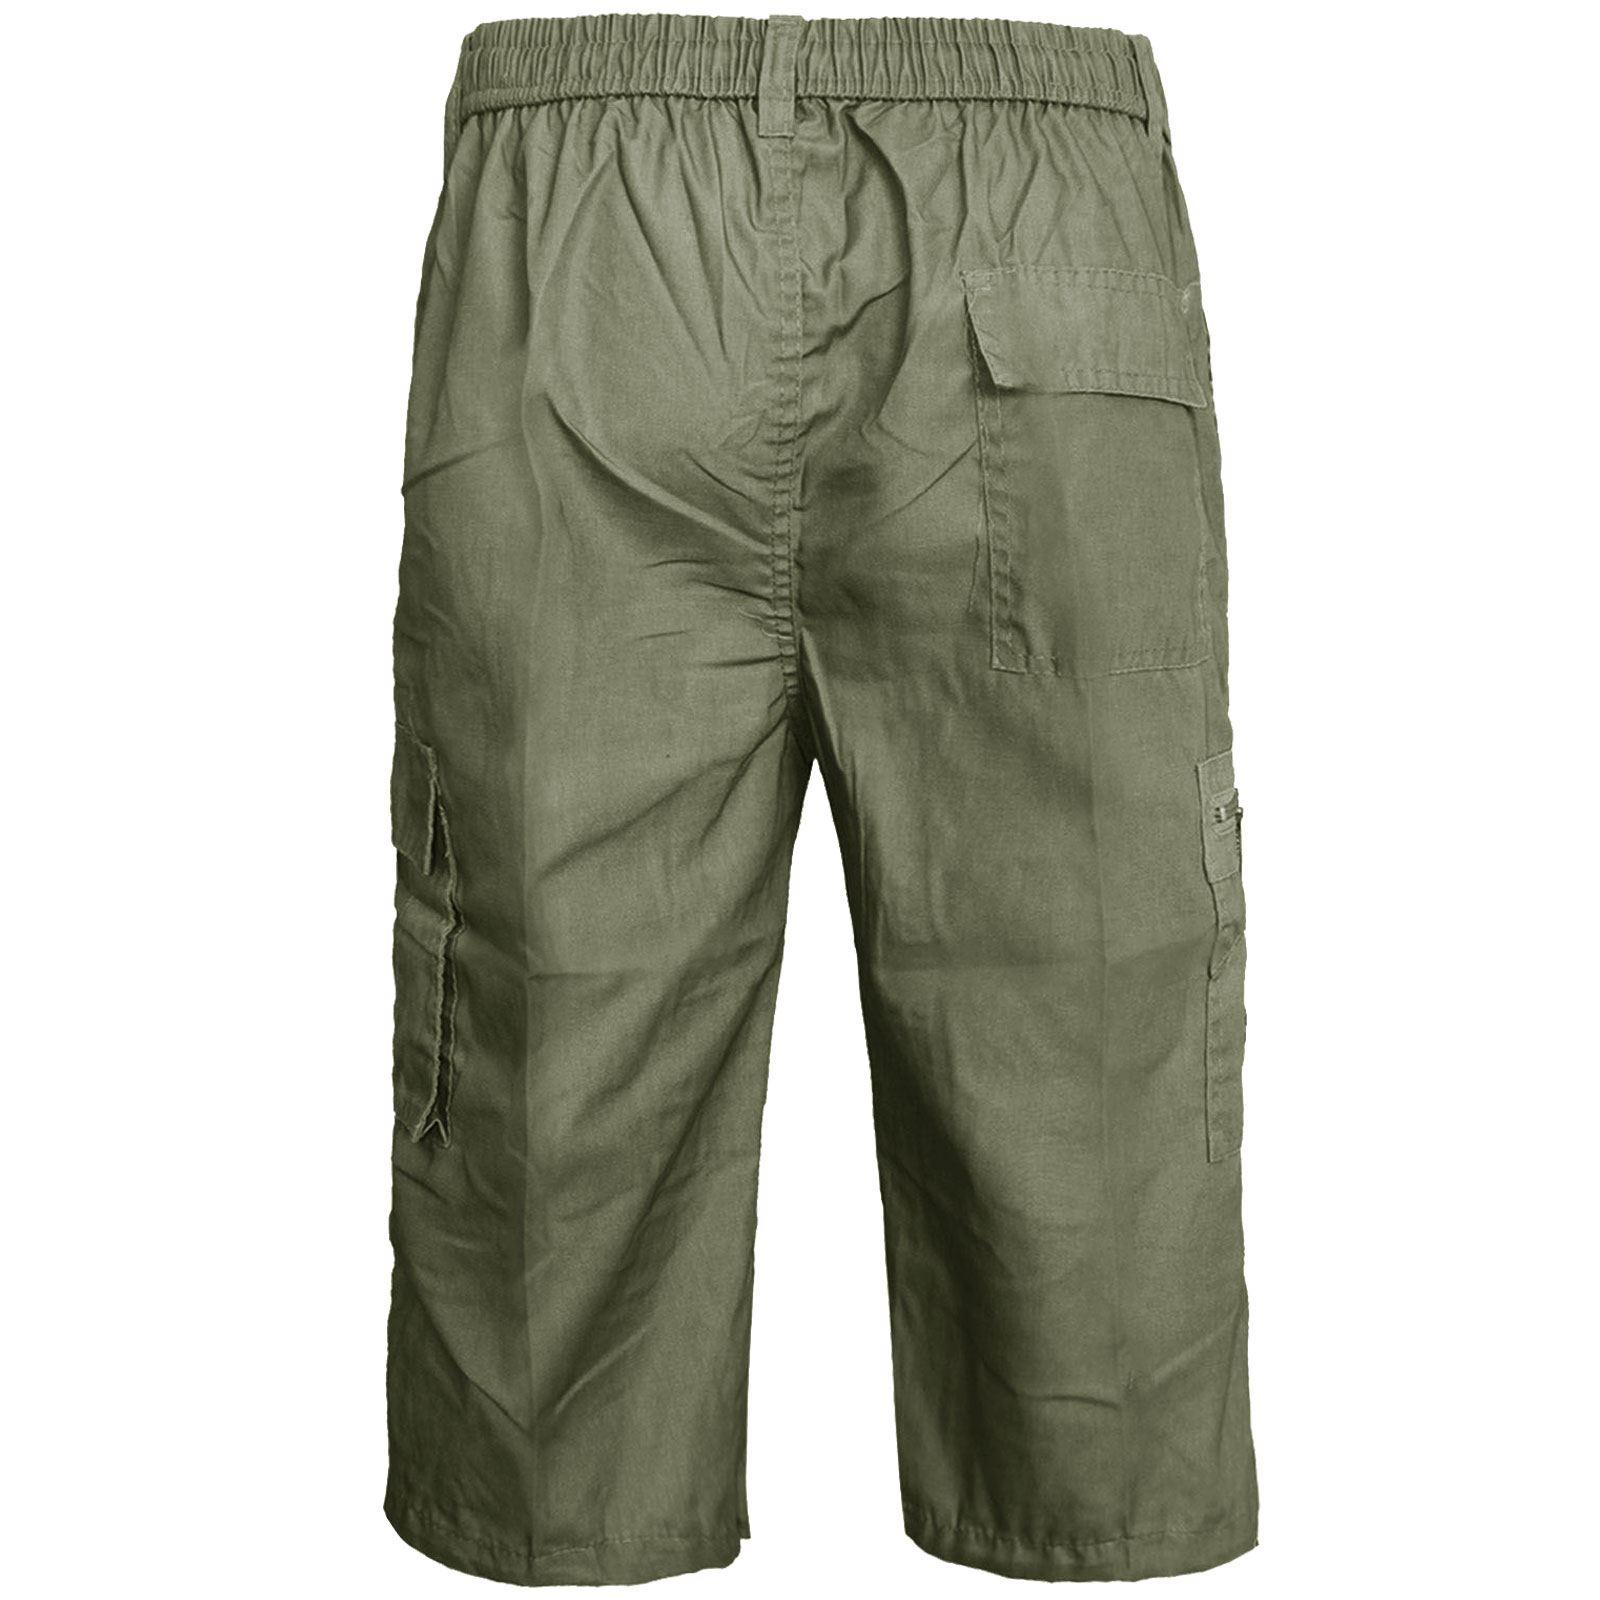 NEW MENS CARGO COMBAT 3//4 SHORTS LONG KNEE LENGTH ELASTICATED WAIST COTTON PANTS